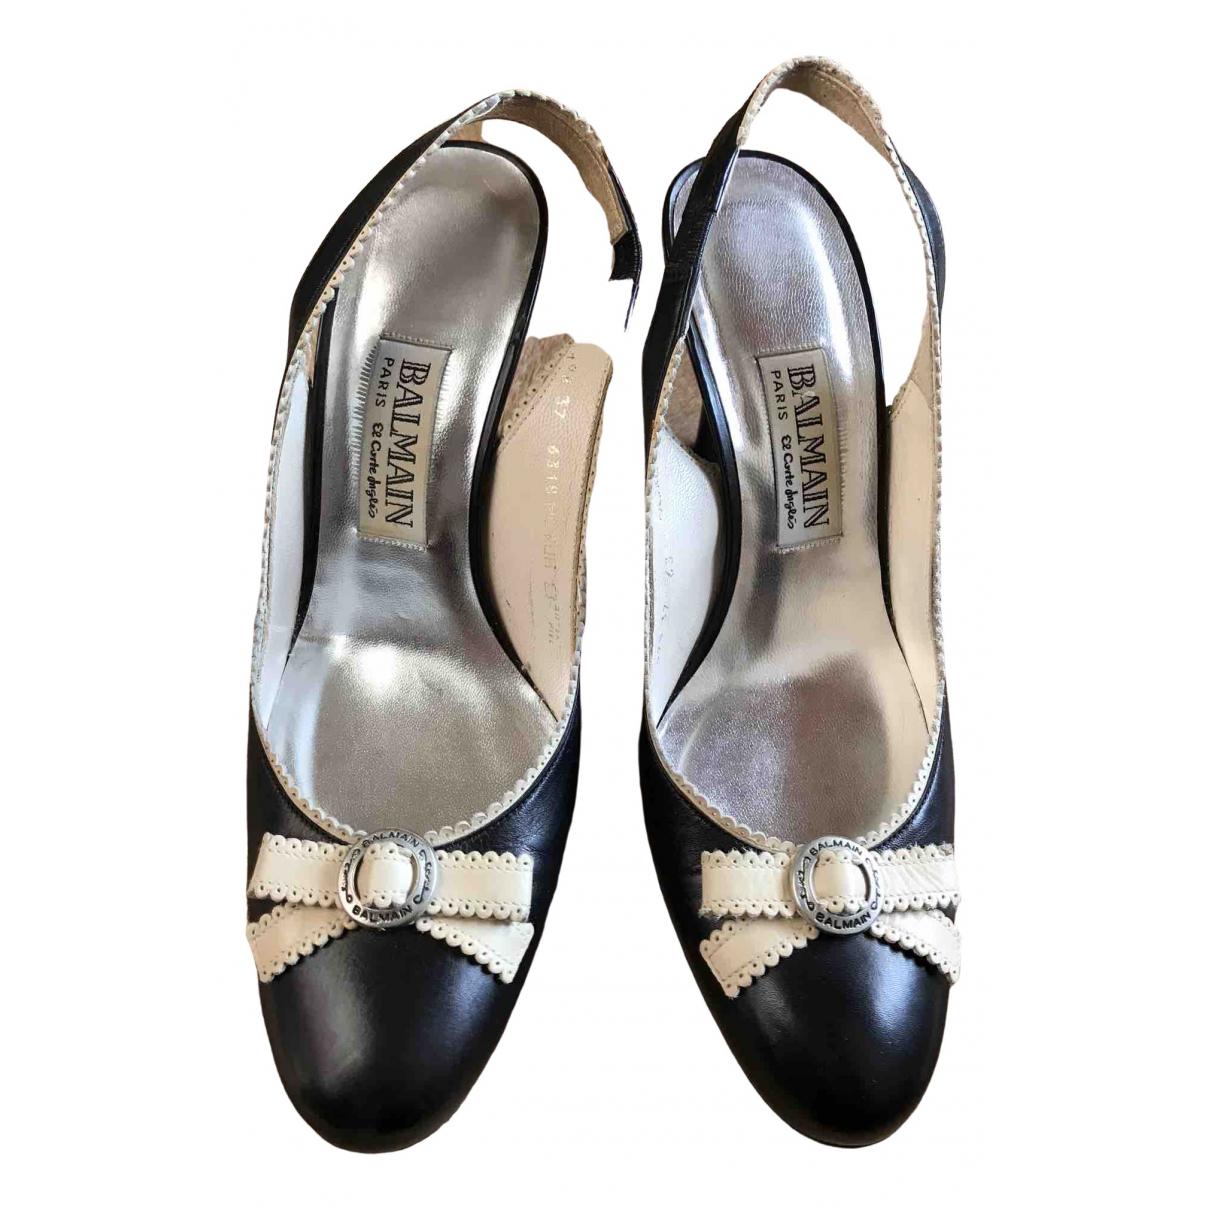 Balmain N Black Leather Sandals for Women 37 EU